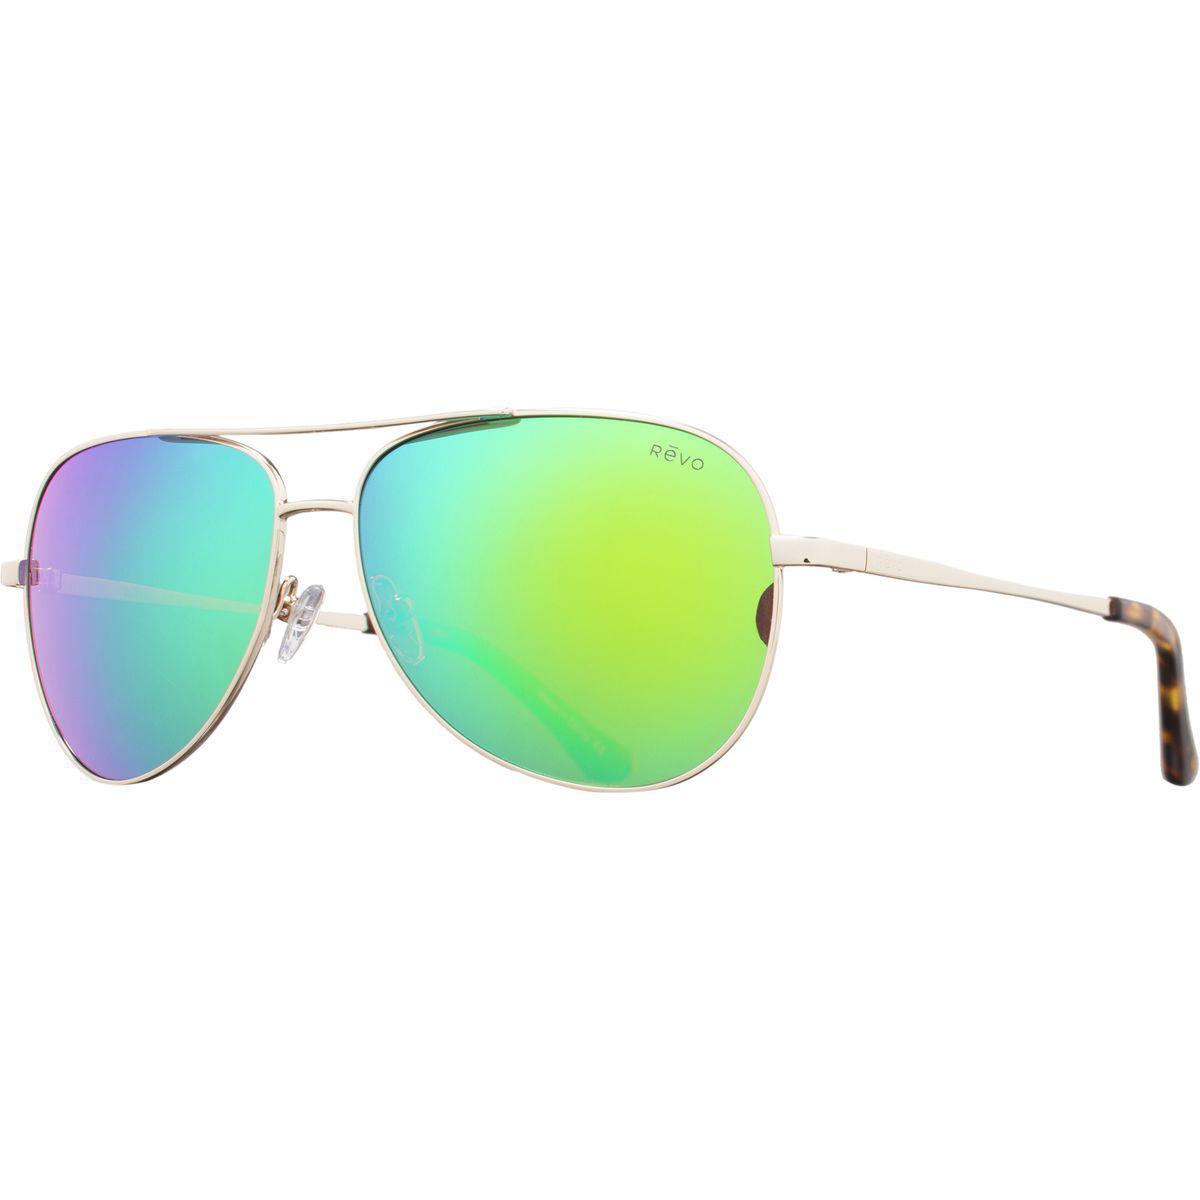 Revo Johnston Polarized Sunglasses